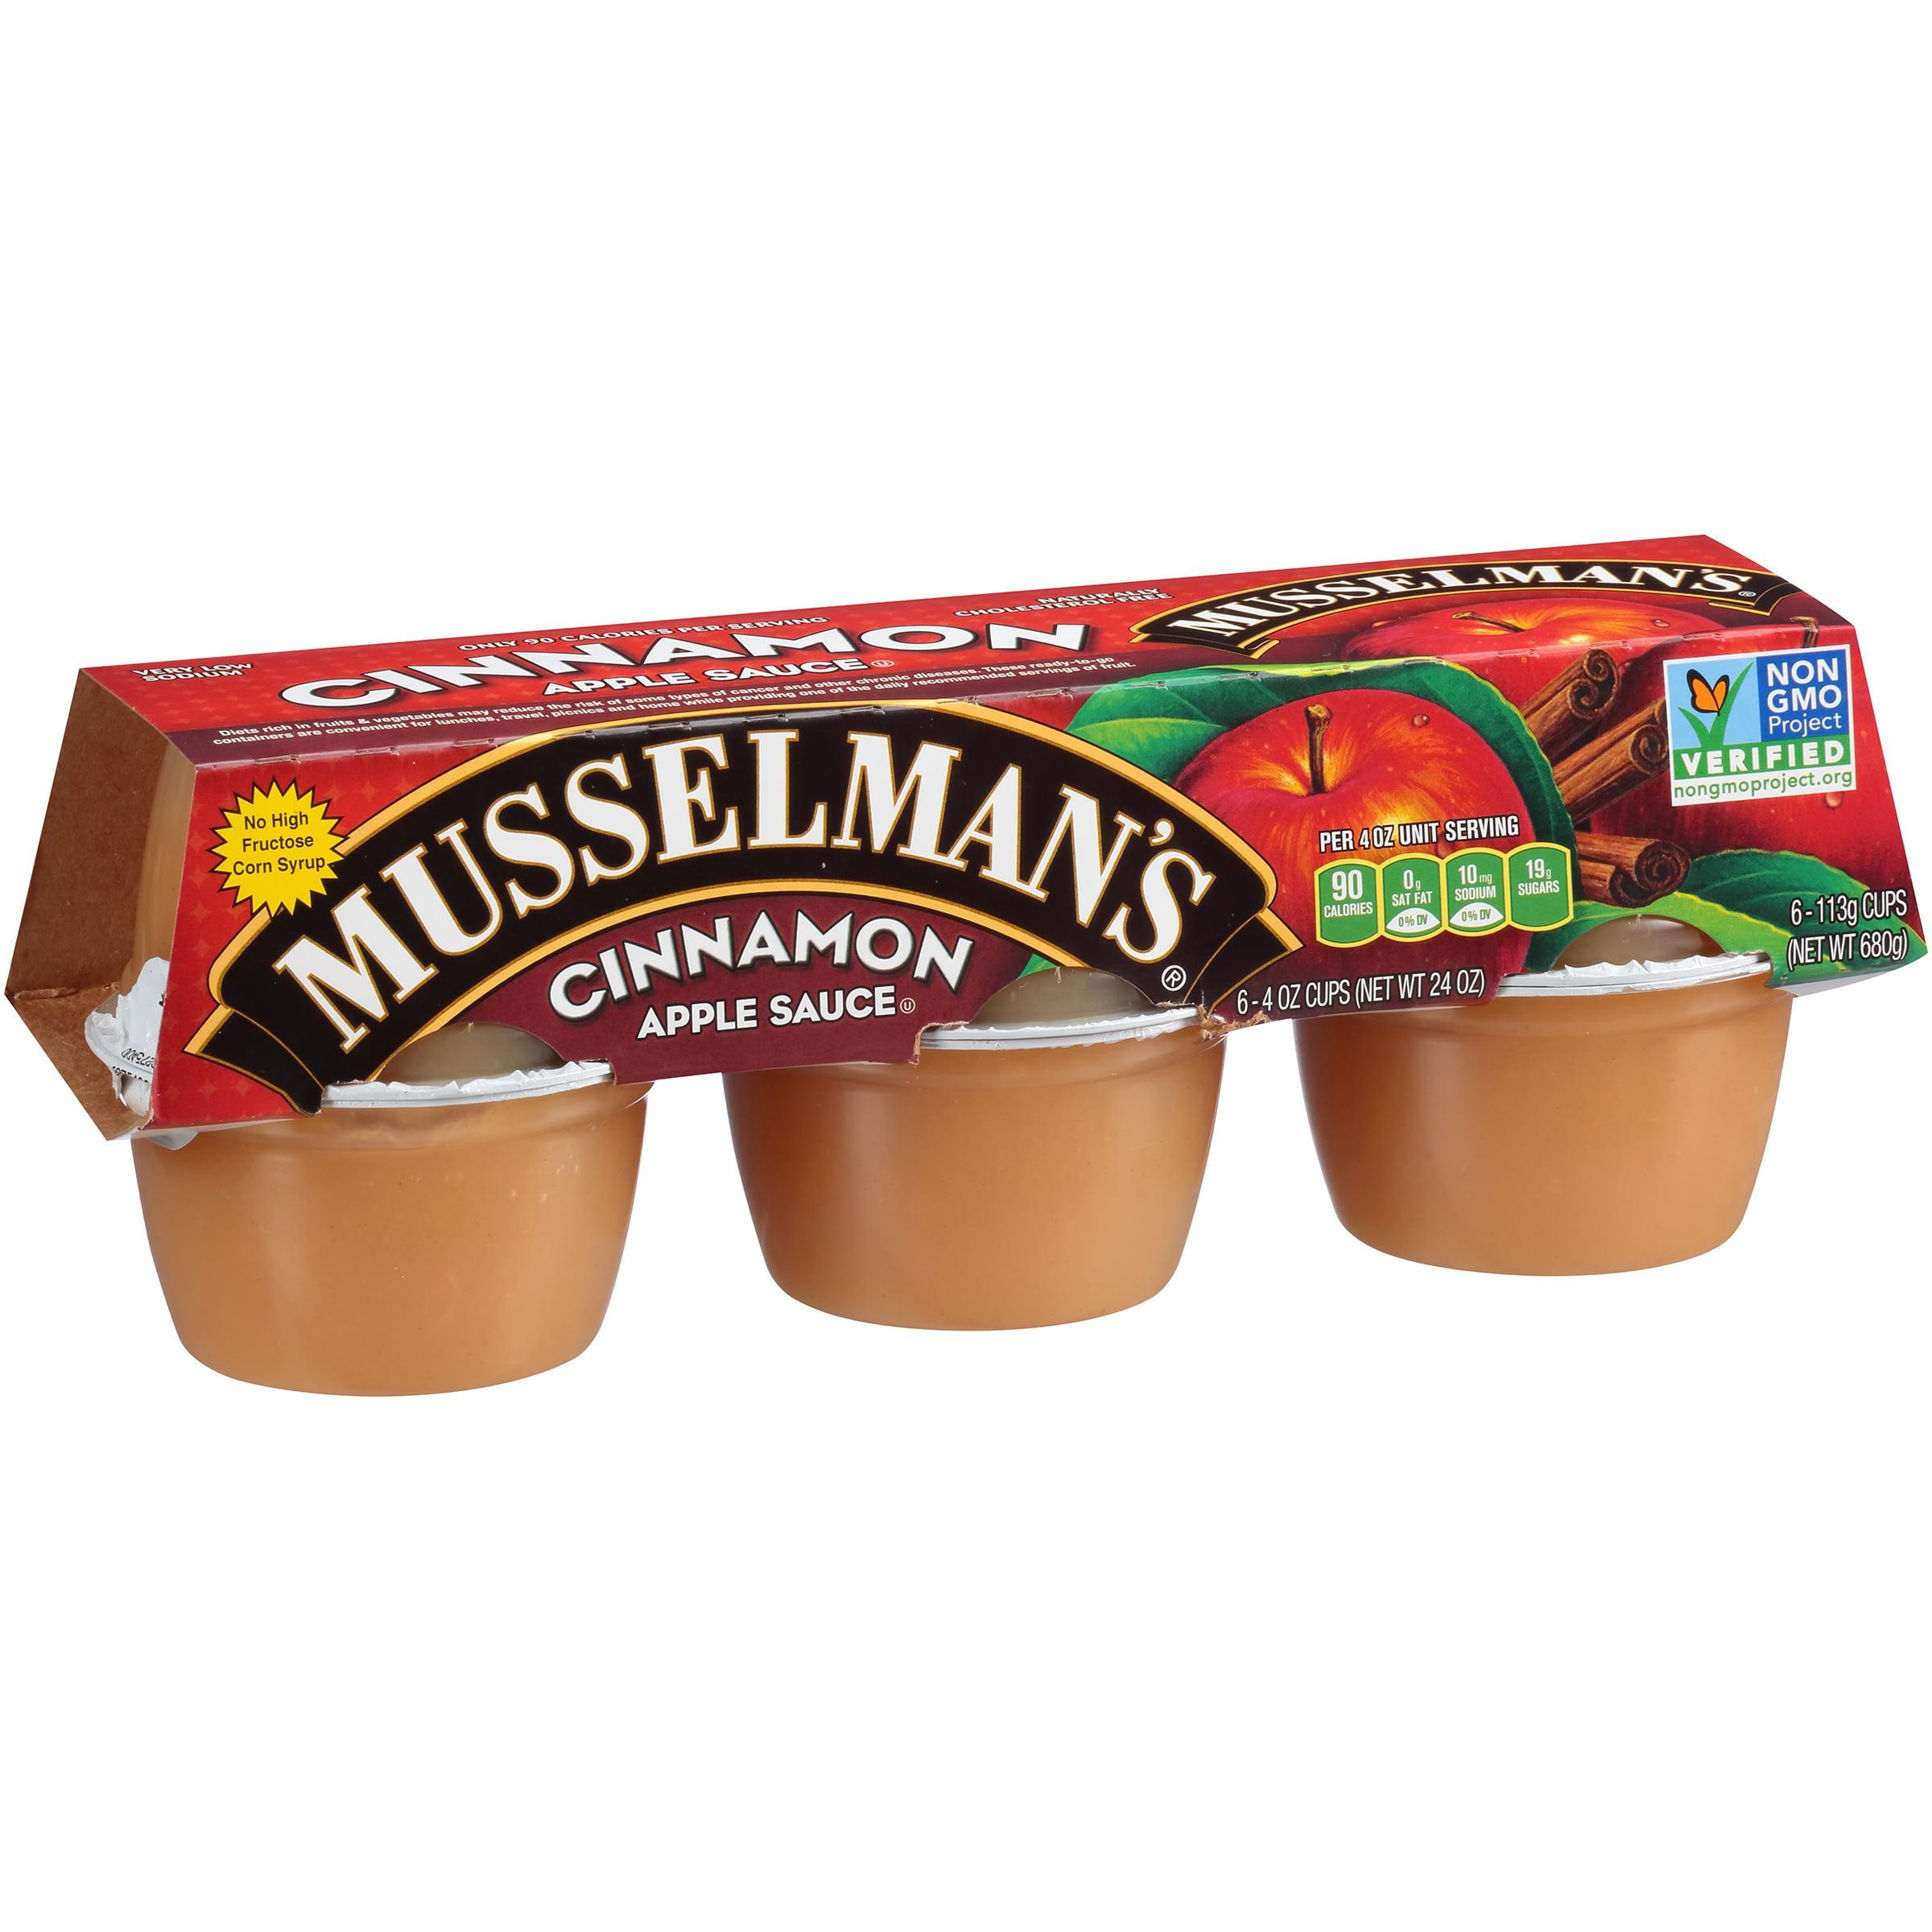 (3 Pack) Musselman's Cinnamon Apple Sauce 6-4 oz. Cups